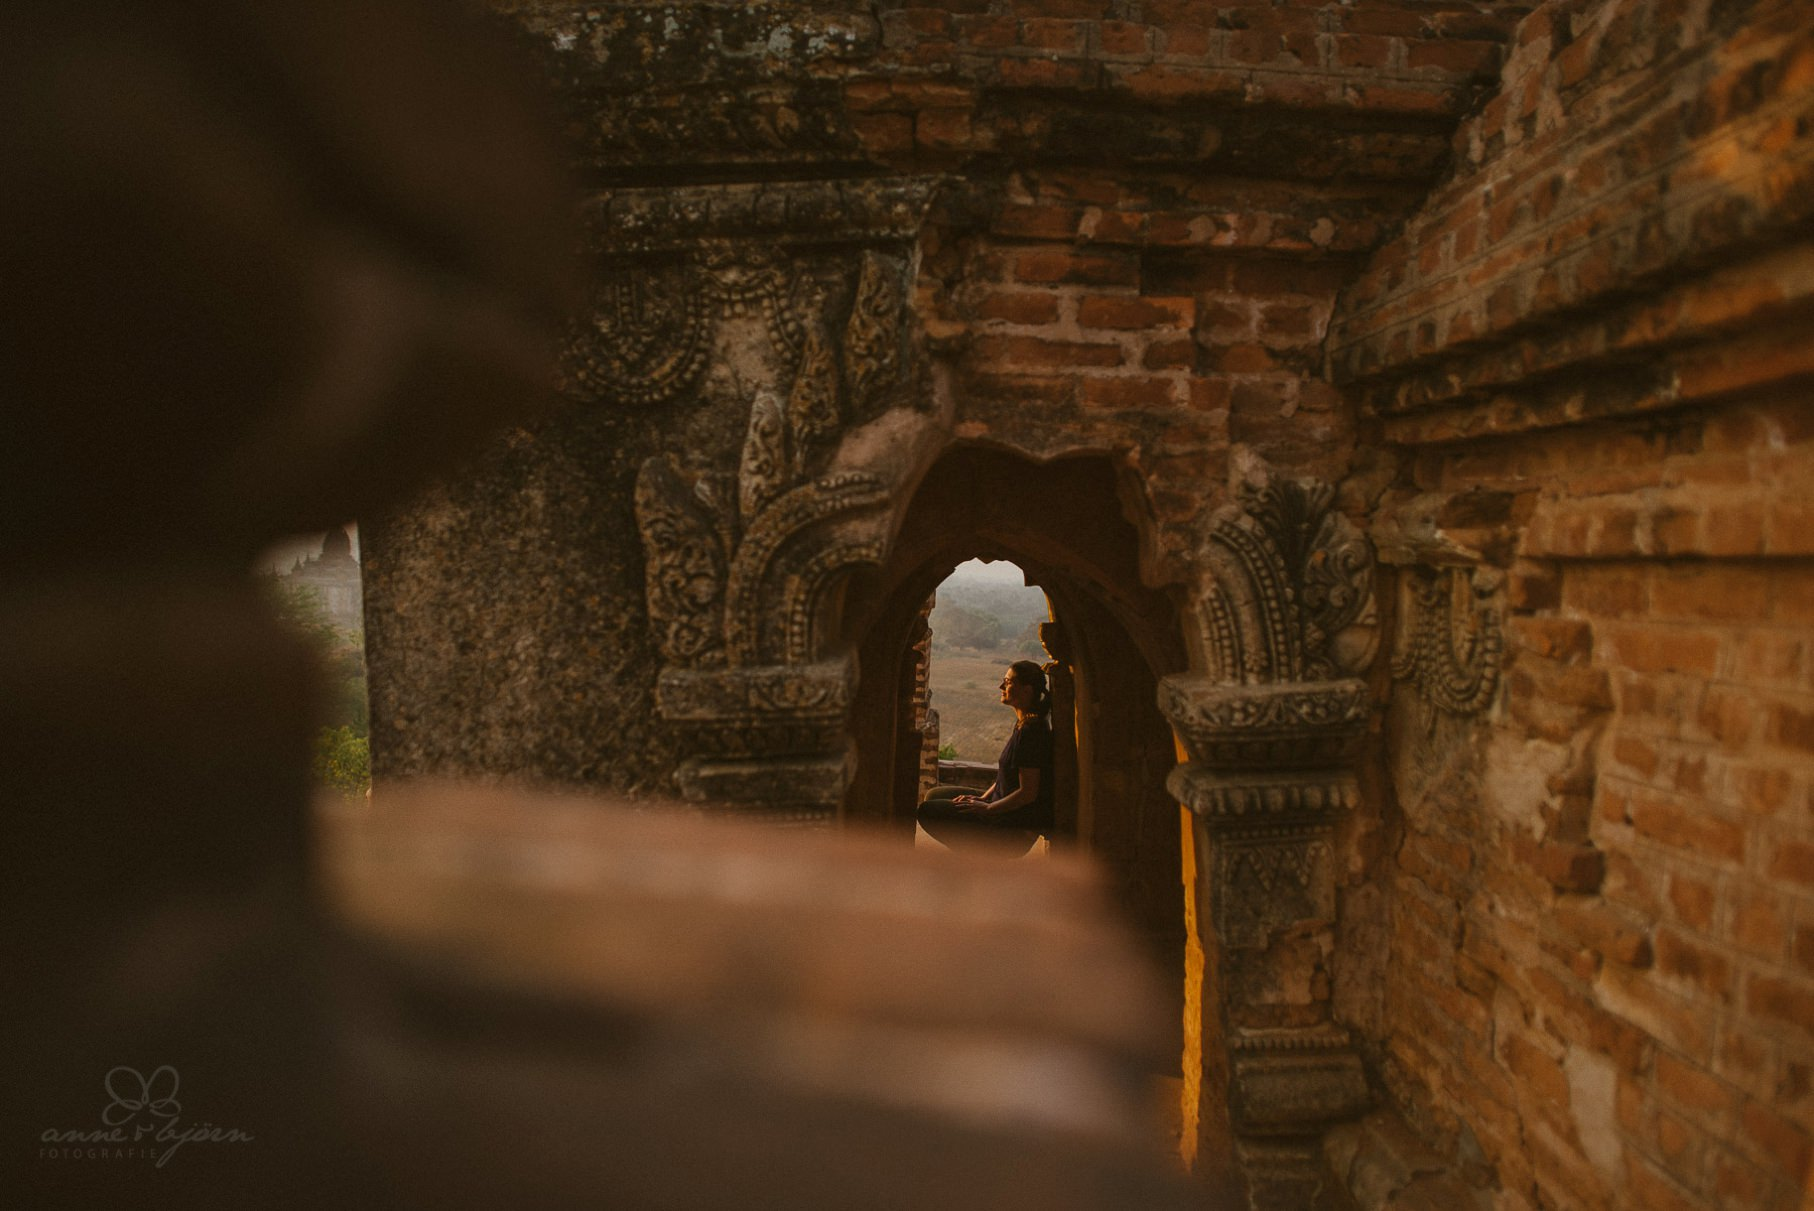 0009 bagan ngwesaung d76 7717 1 - Tempelstadt Bagan & tauchen am Ngwesaungbeach